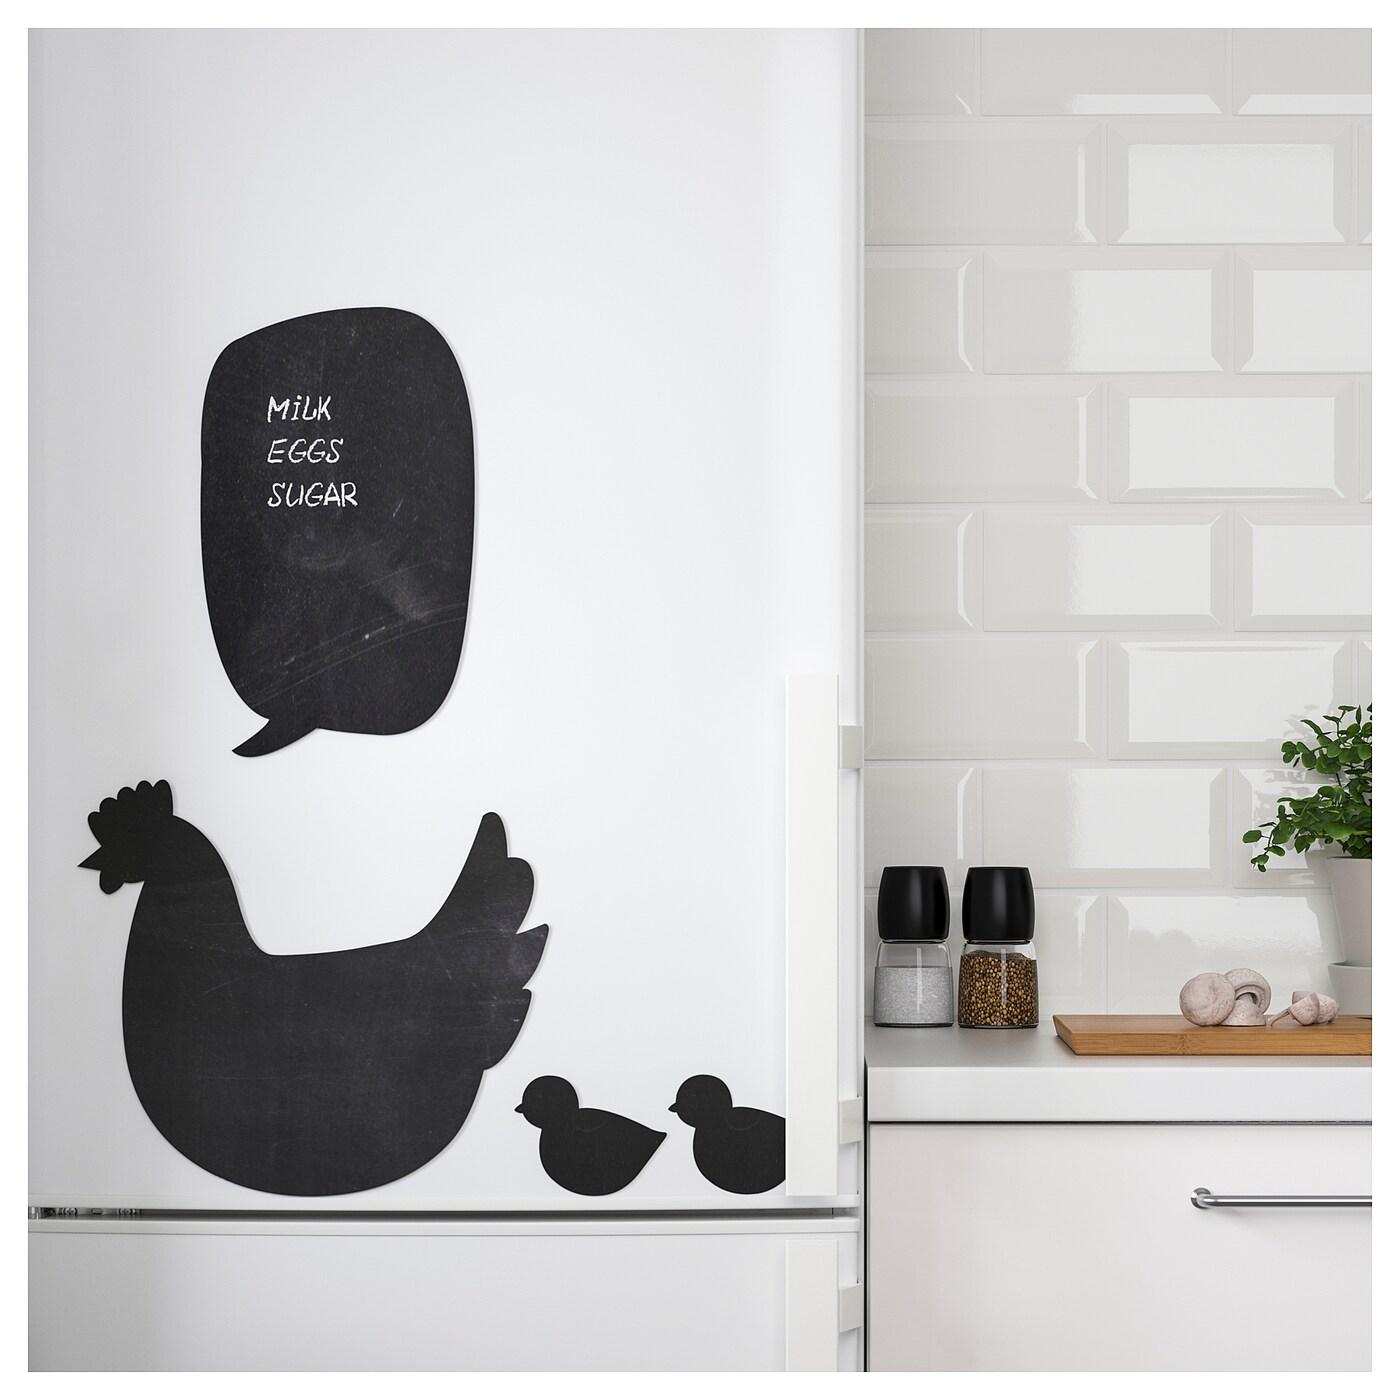 Kl tta decoration stickers blackboard labels ikea - Miroir stickers ikea ...